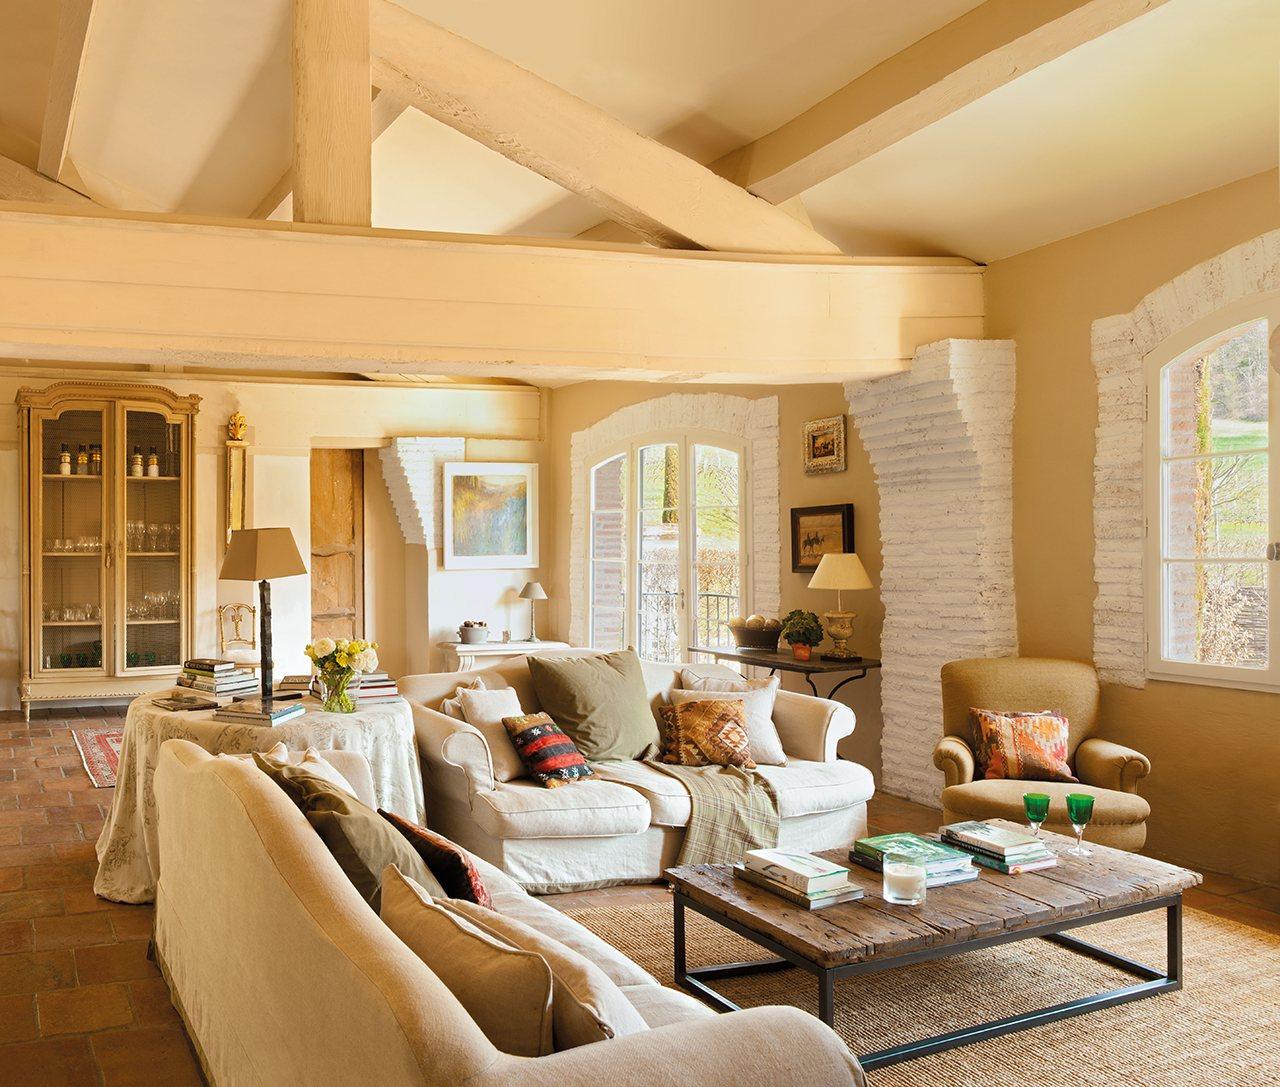 20 salones para inspirarte - Muebles en crudo para pintar ...